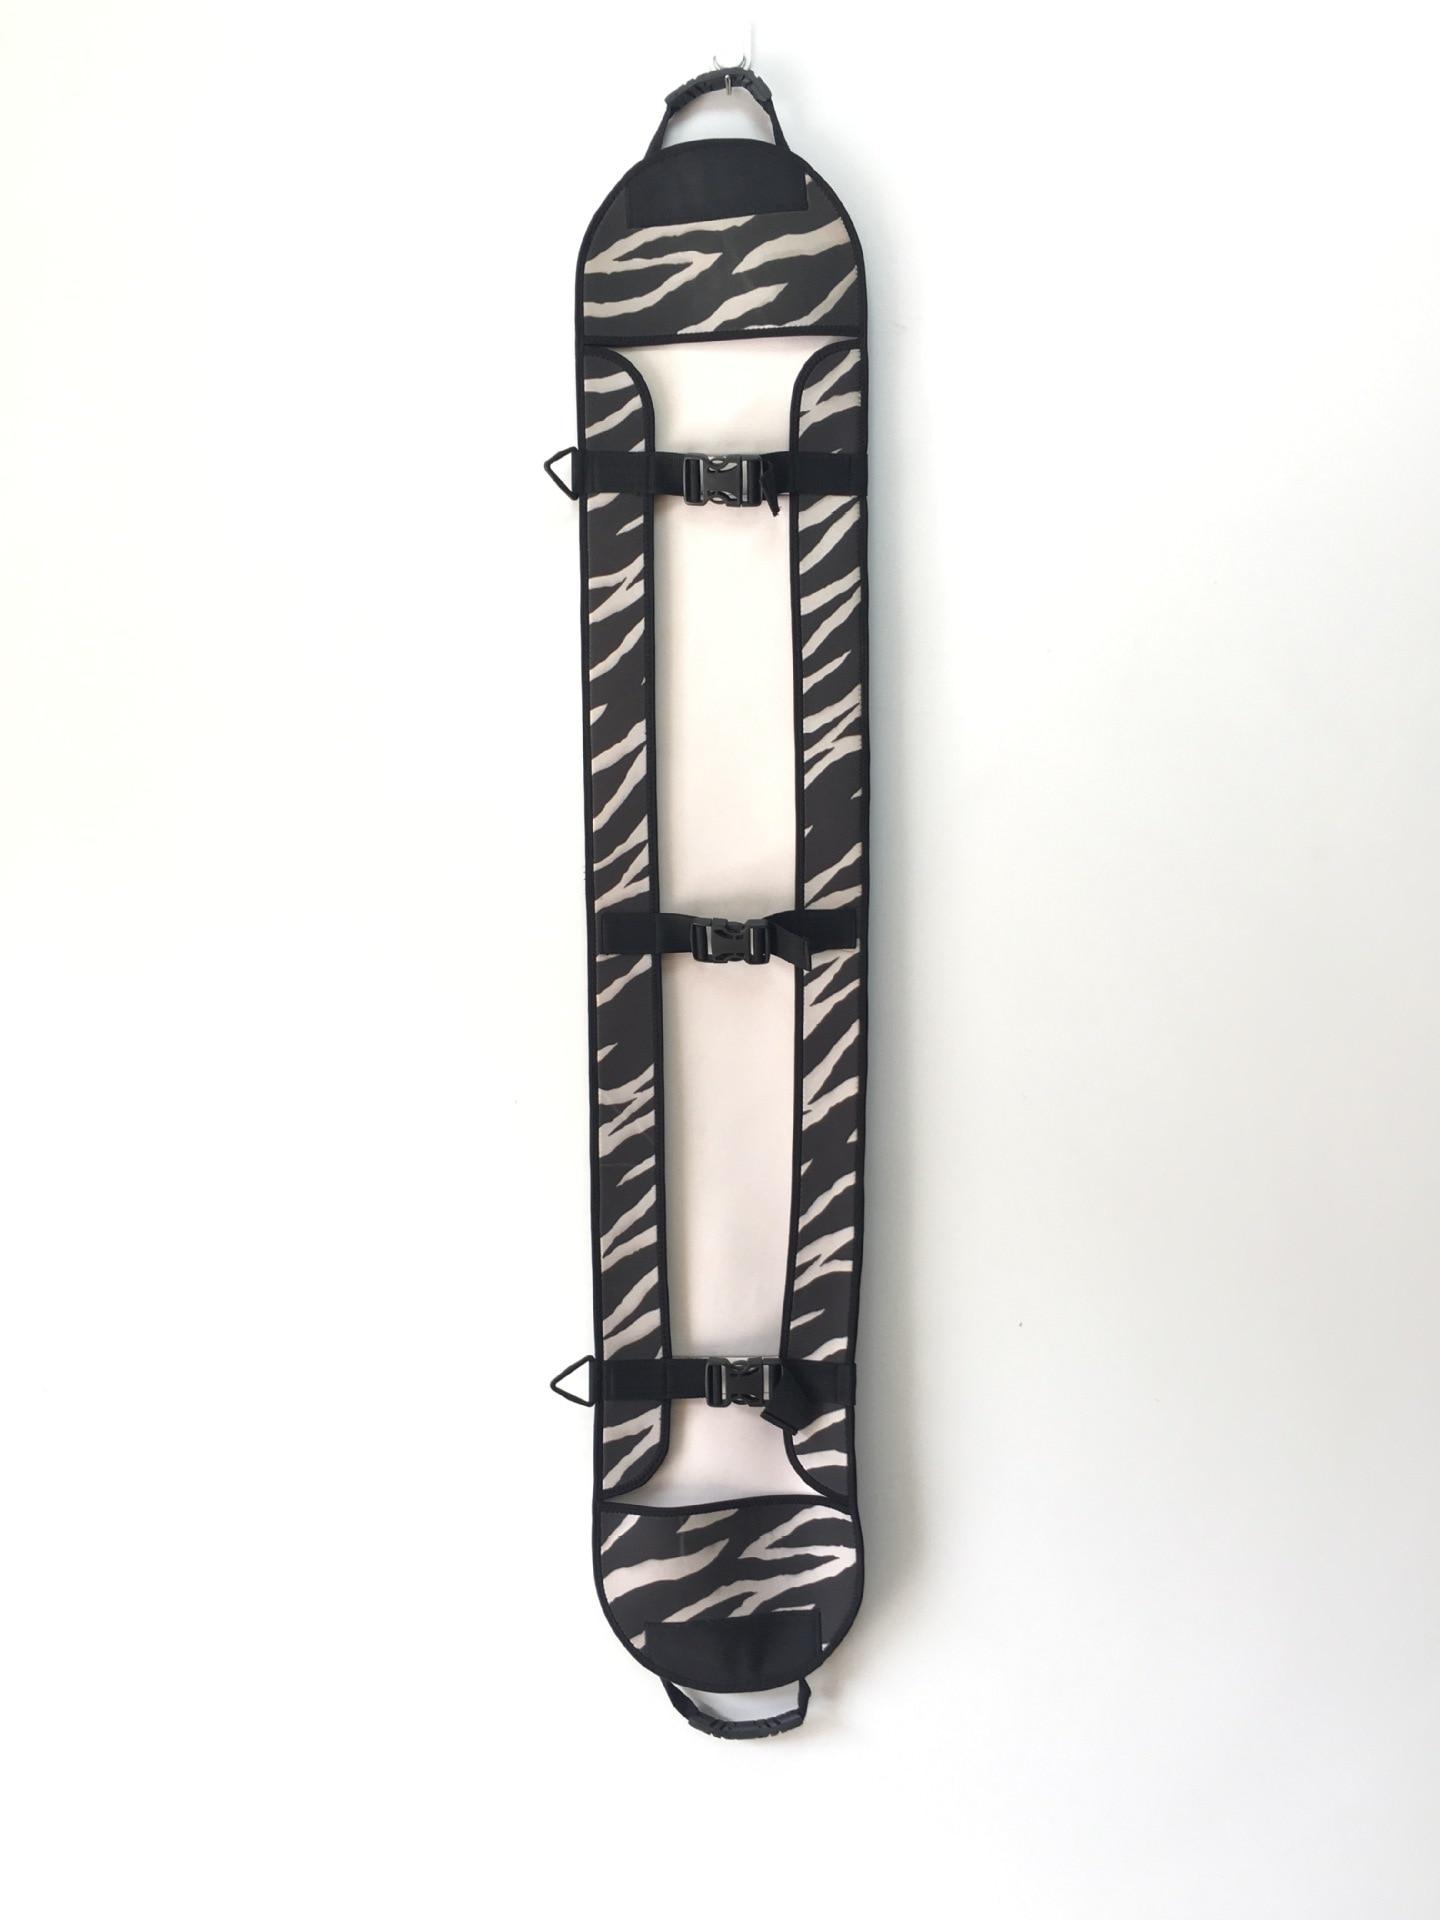 Sac de ski de plein air portable pack de ski snowboard placage fournitures de ski A5212 - 3